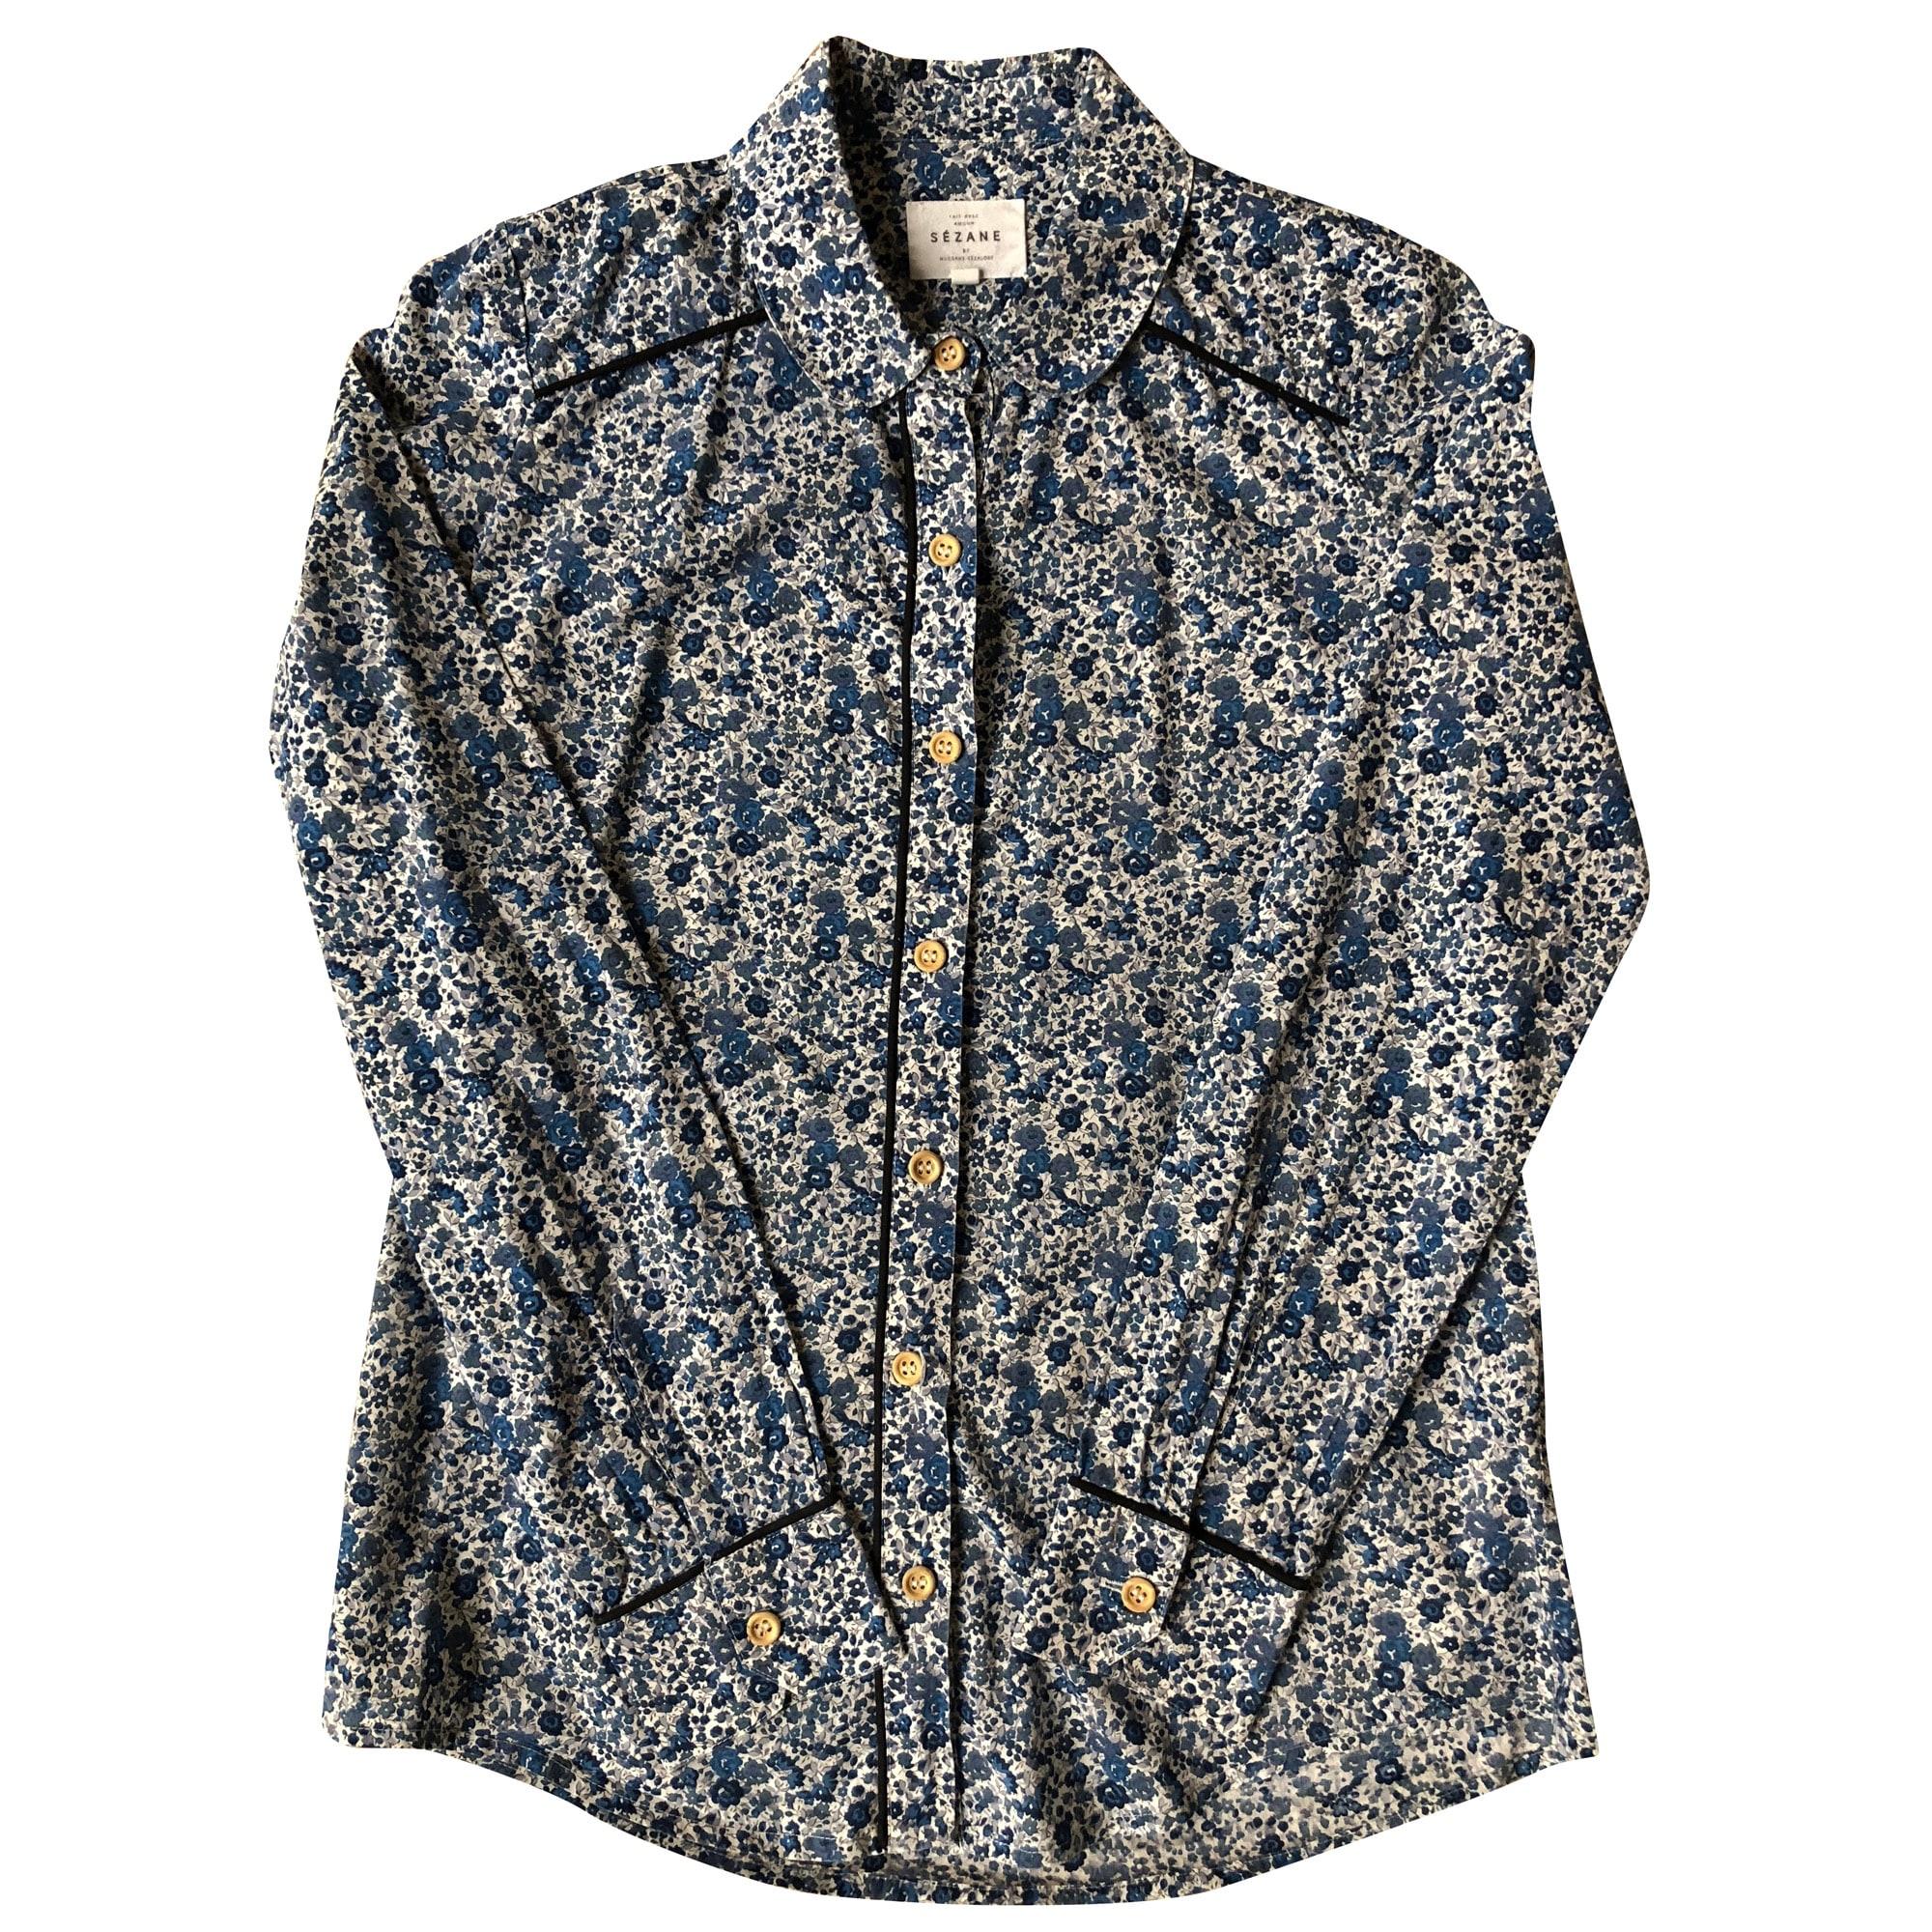 Shirt SÉZANE Blue, navy, turquoise